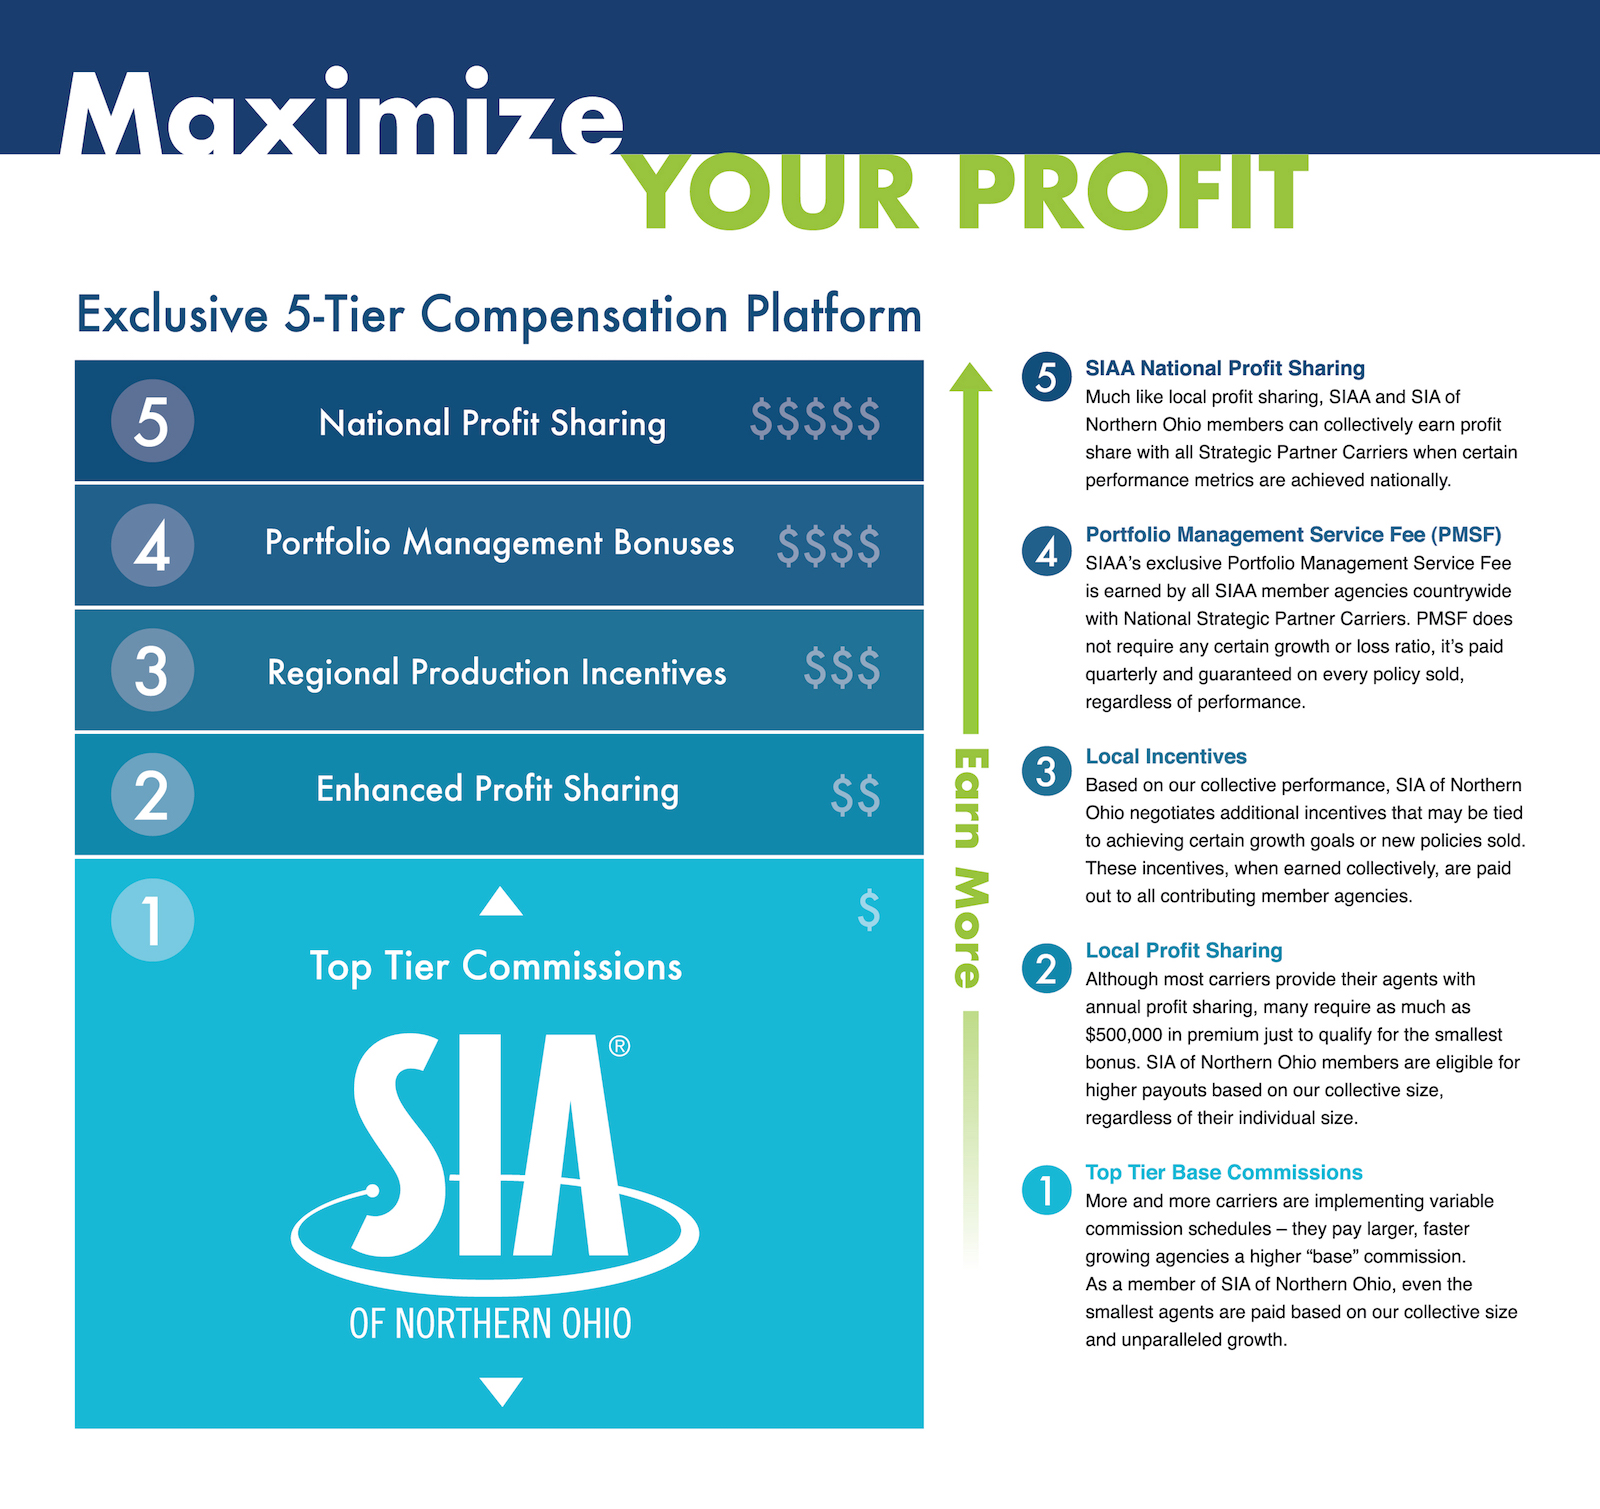 SIA Maximize Your Profit